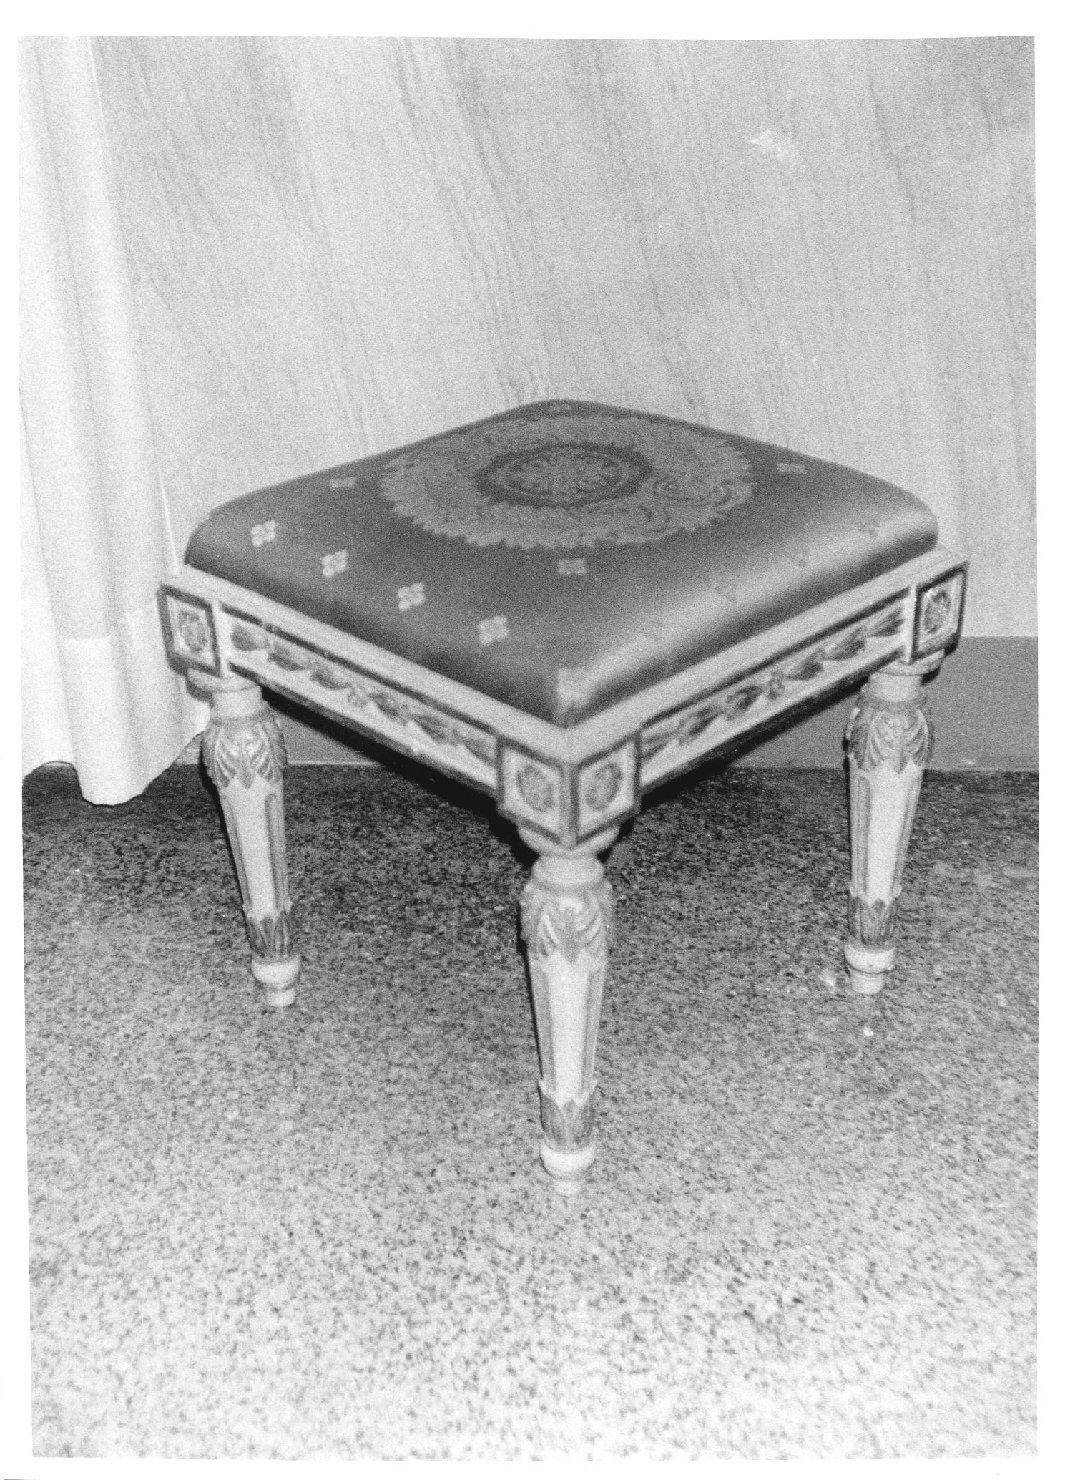 sgabello, serie - manifattura piemontese (sec. XIX)